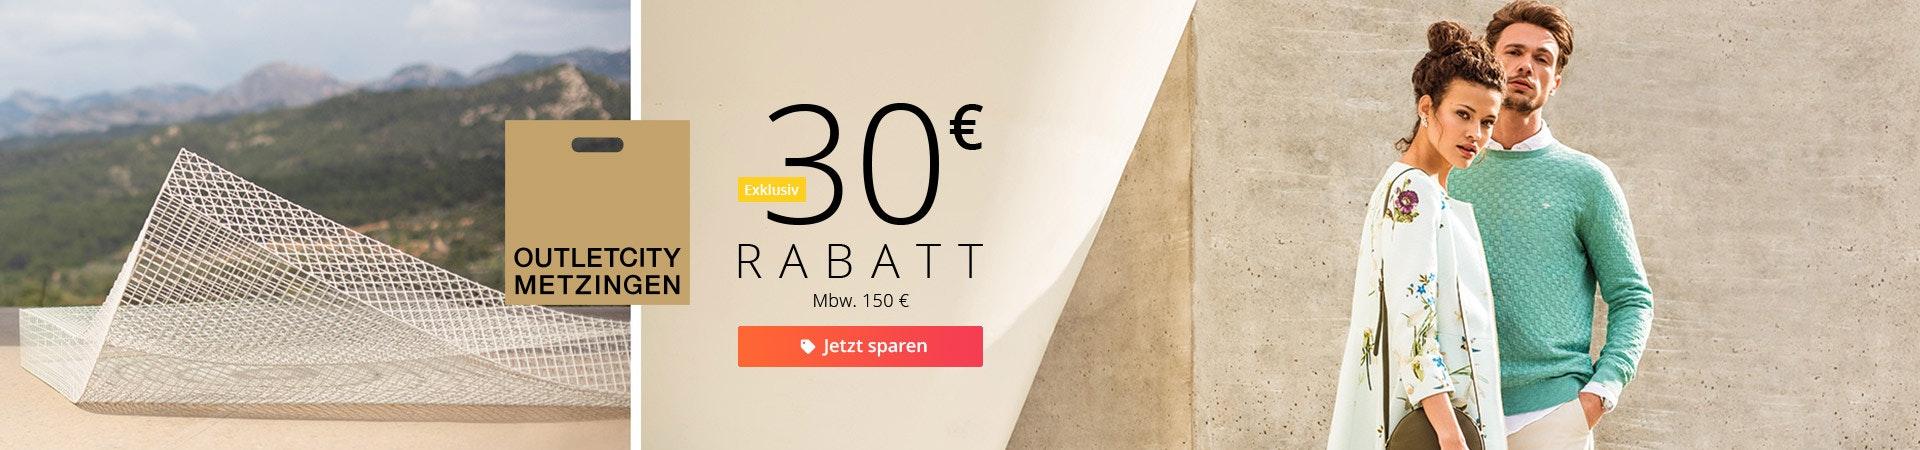 Outletcity 30 euro